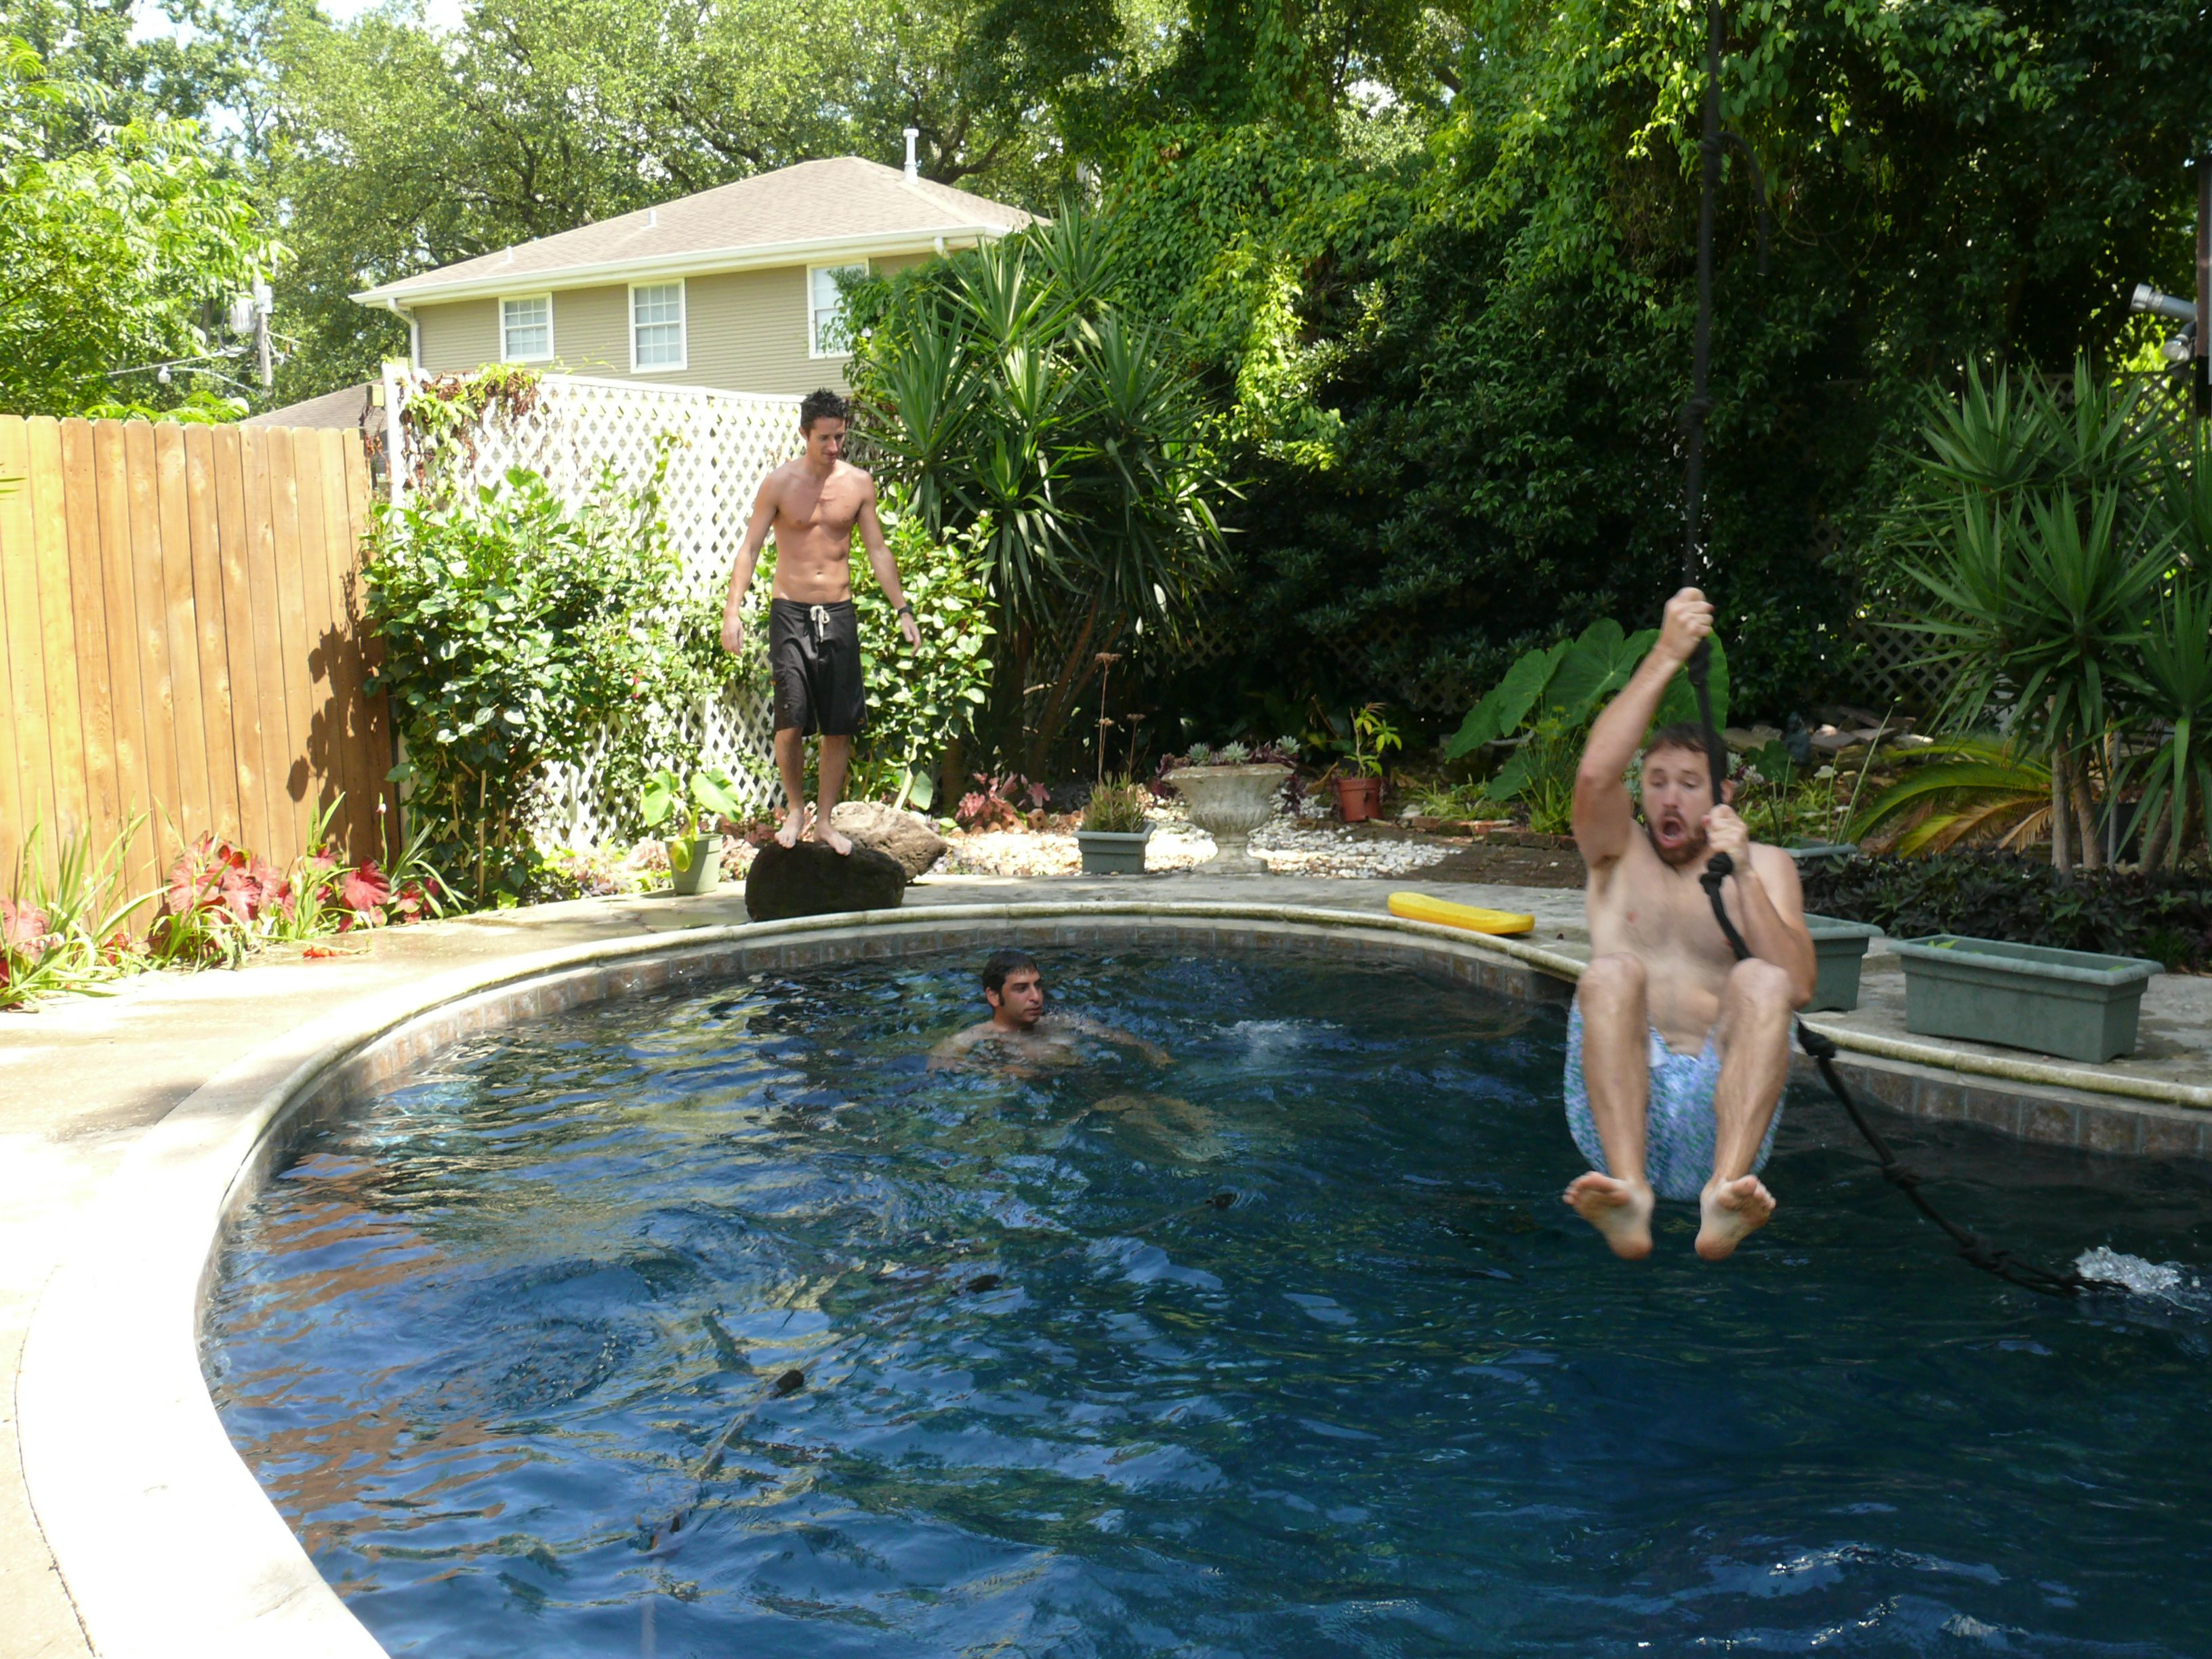 Backyard Playground, Backyard For Kids, Zip Line Backyard